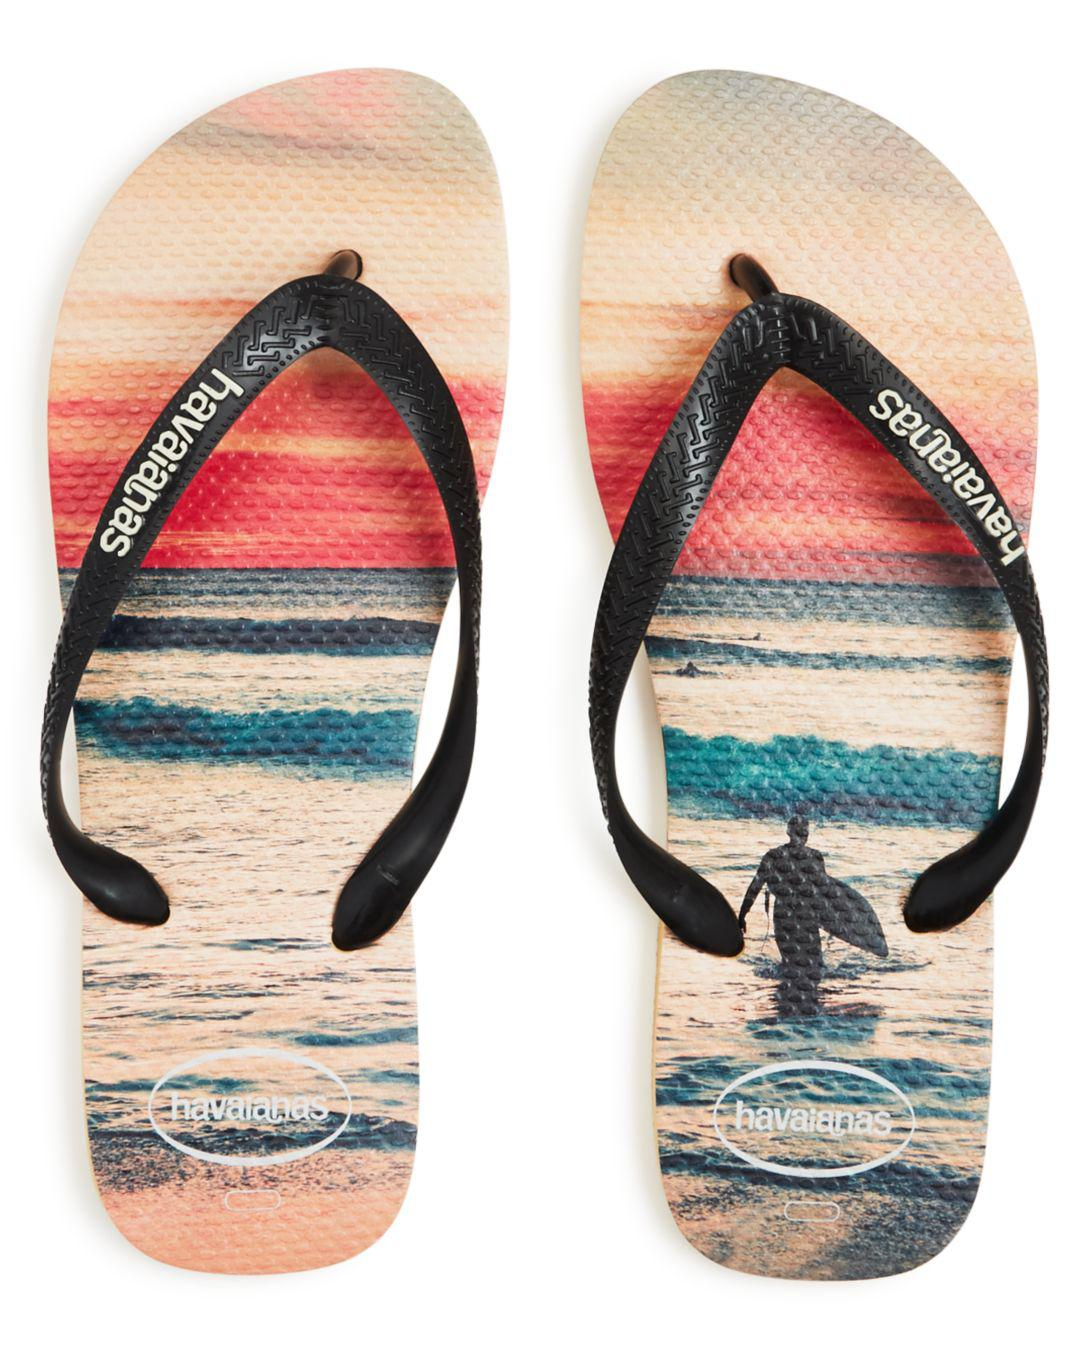 8bb2e3ac61d8 Lyst - Havaianas Men s Hype Beach Print Flip-flops in White for Men